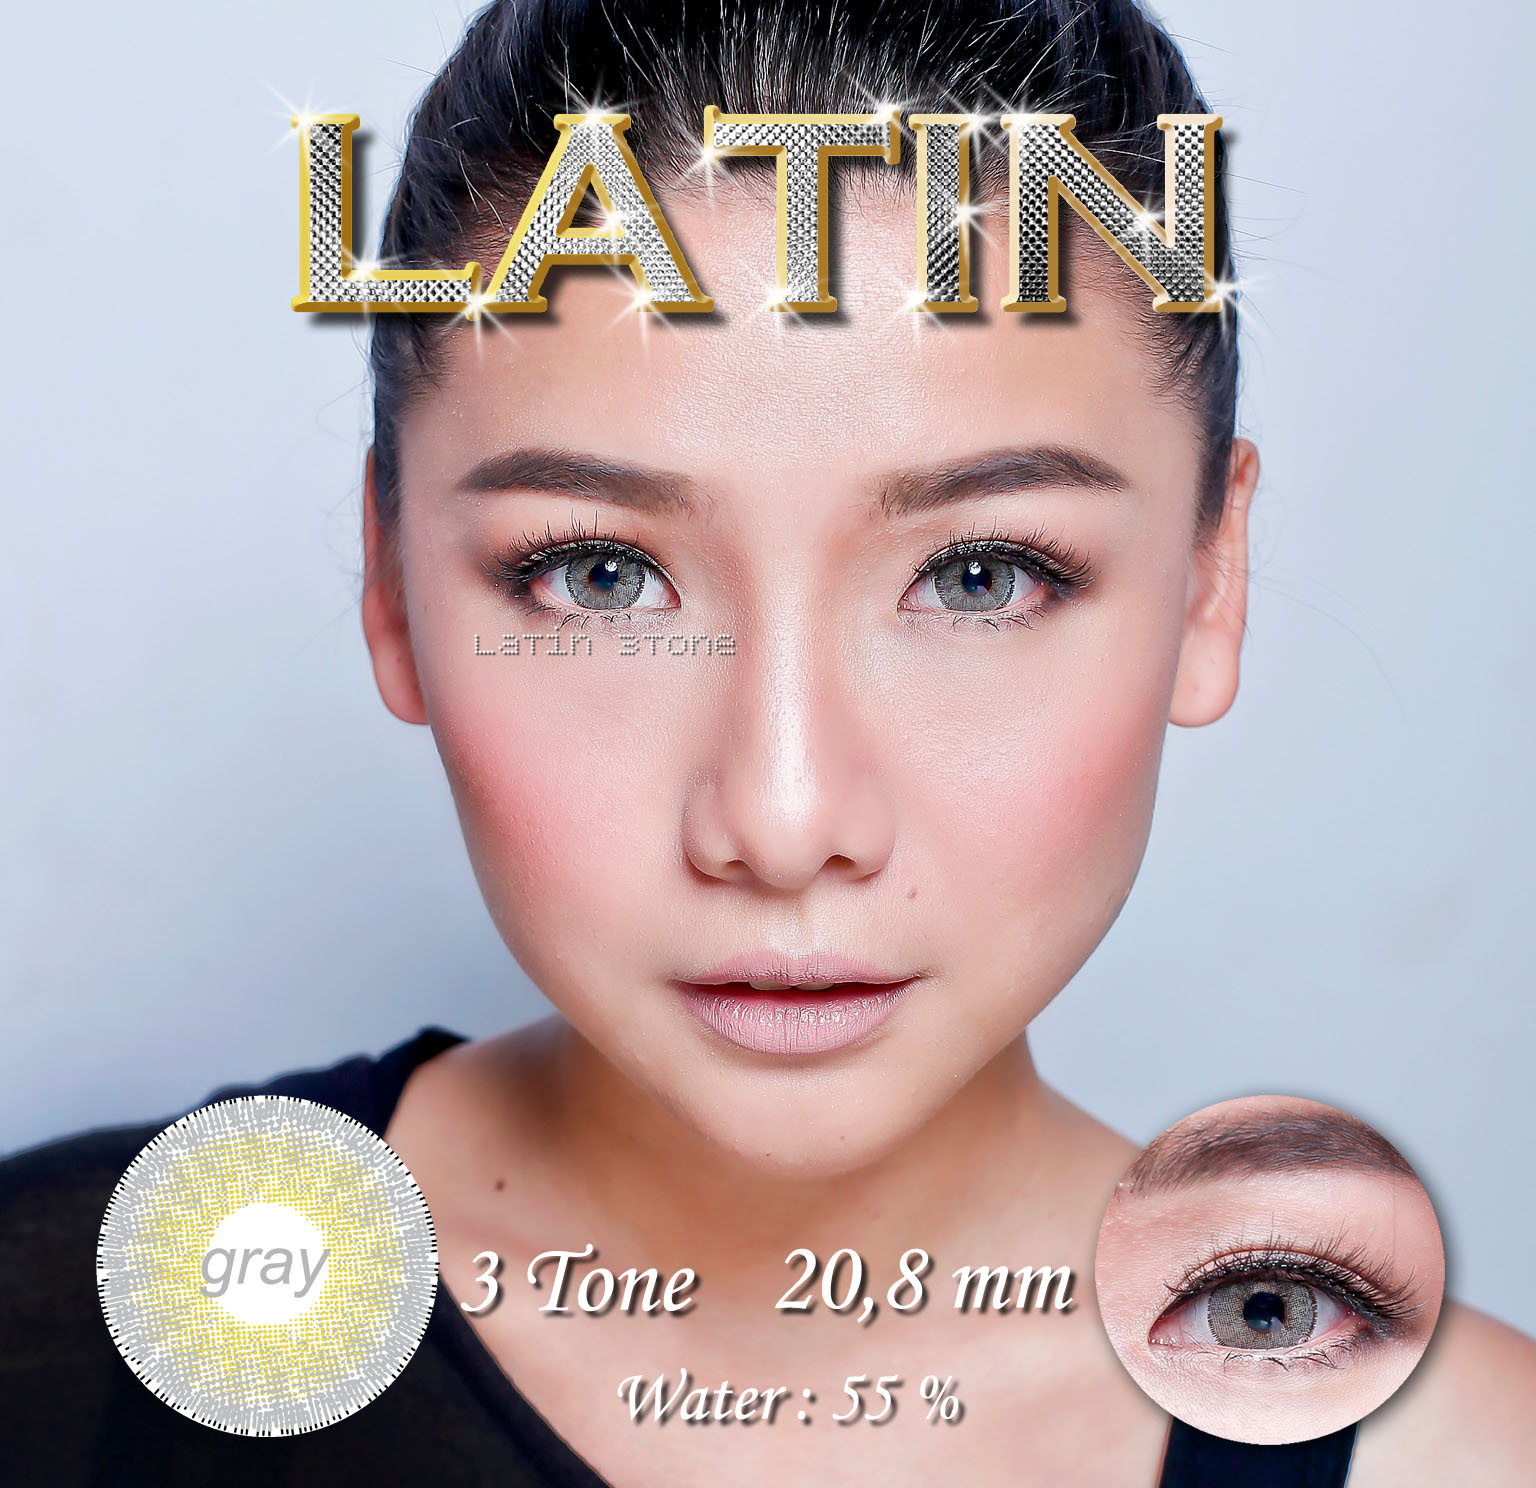 Eyezone Zahara Softlens Black Gratis Lenscase 3. Source · Softlens LATIN 3 Tone 20.8mm .